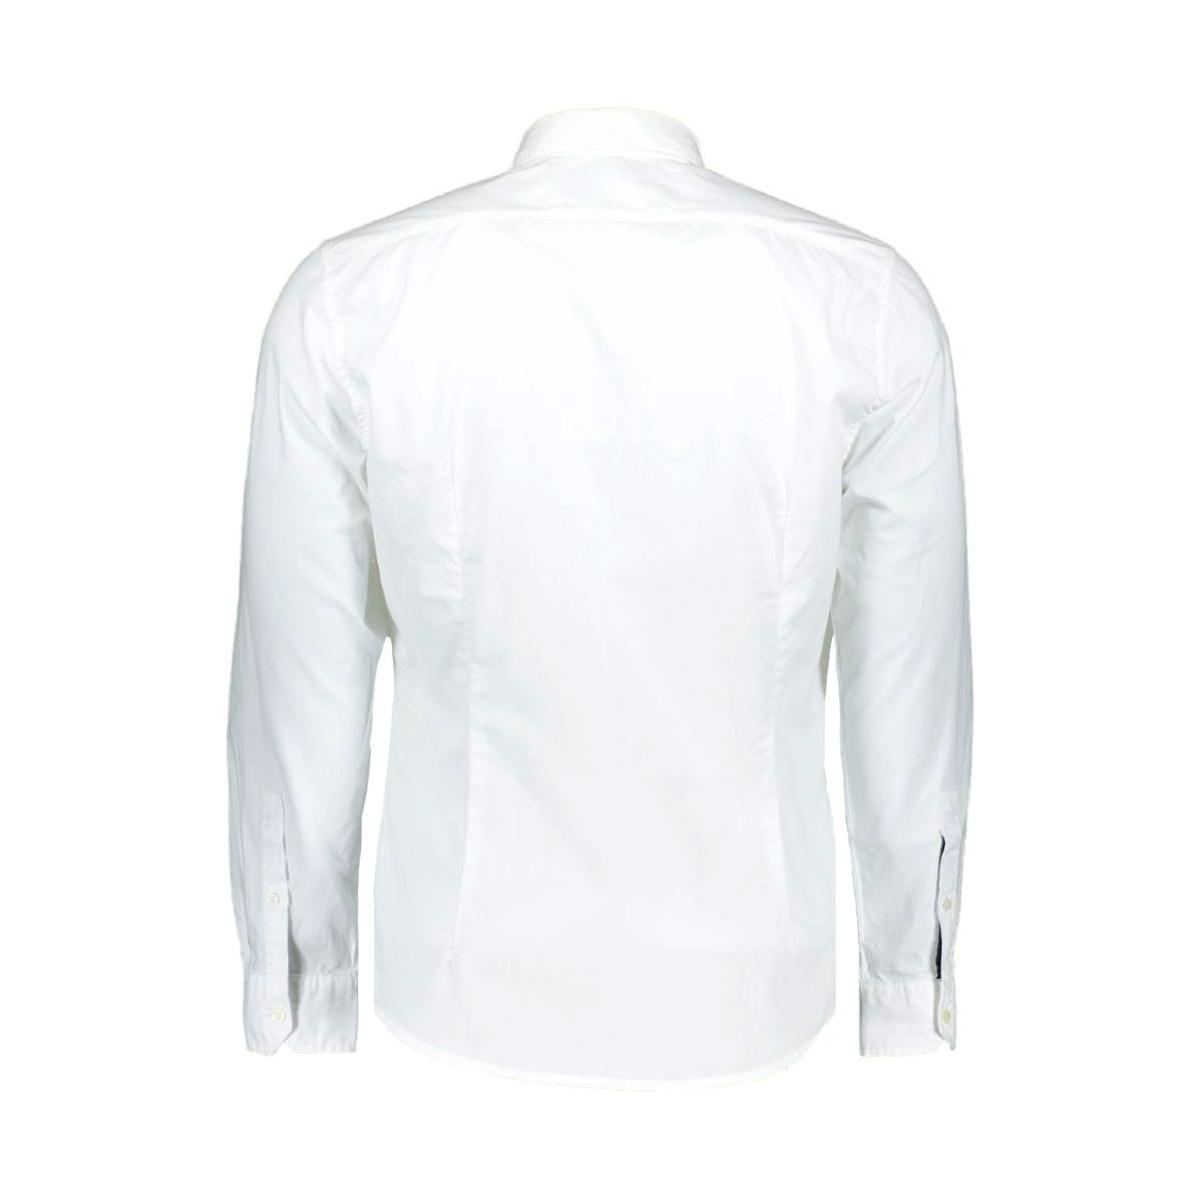 997ee2f801 esprit overhemd e100